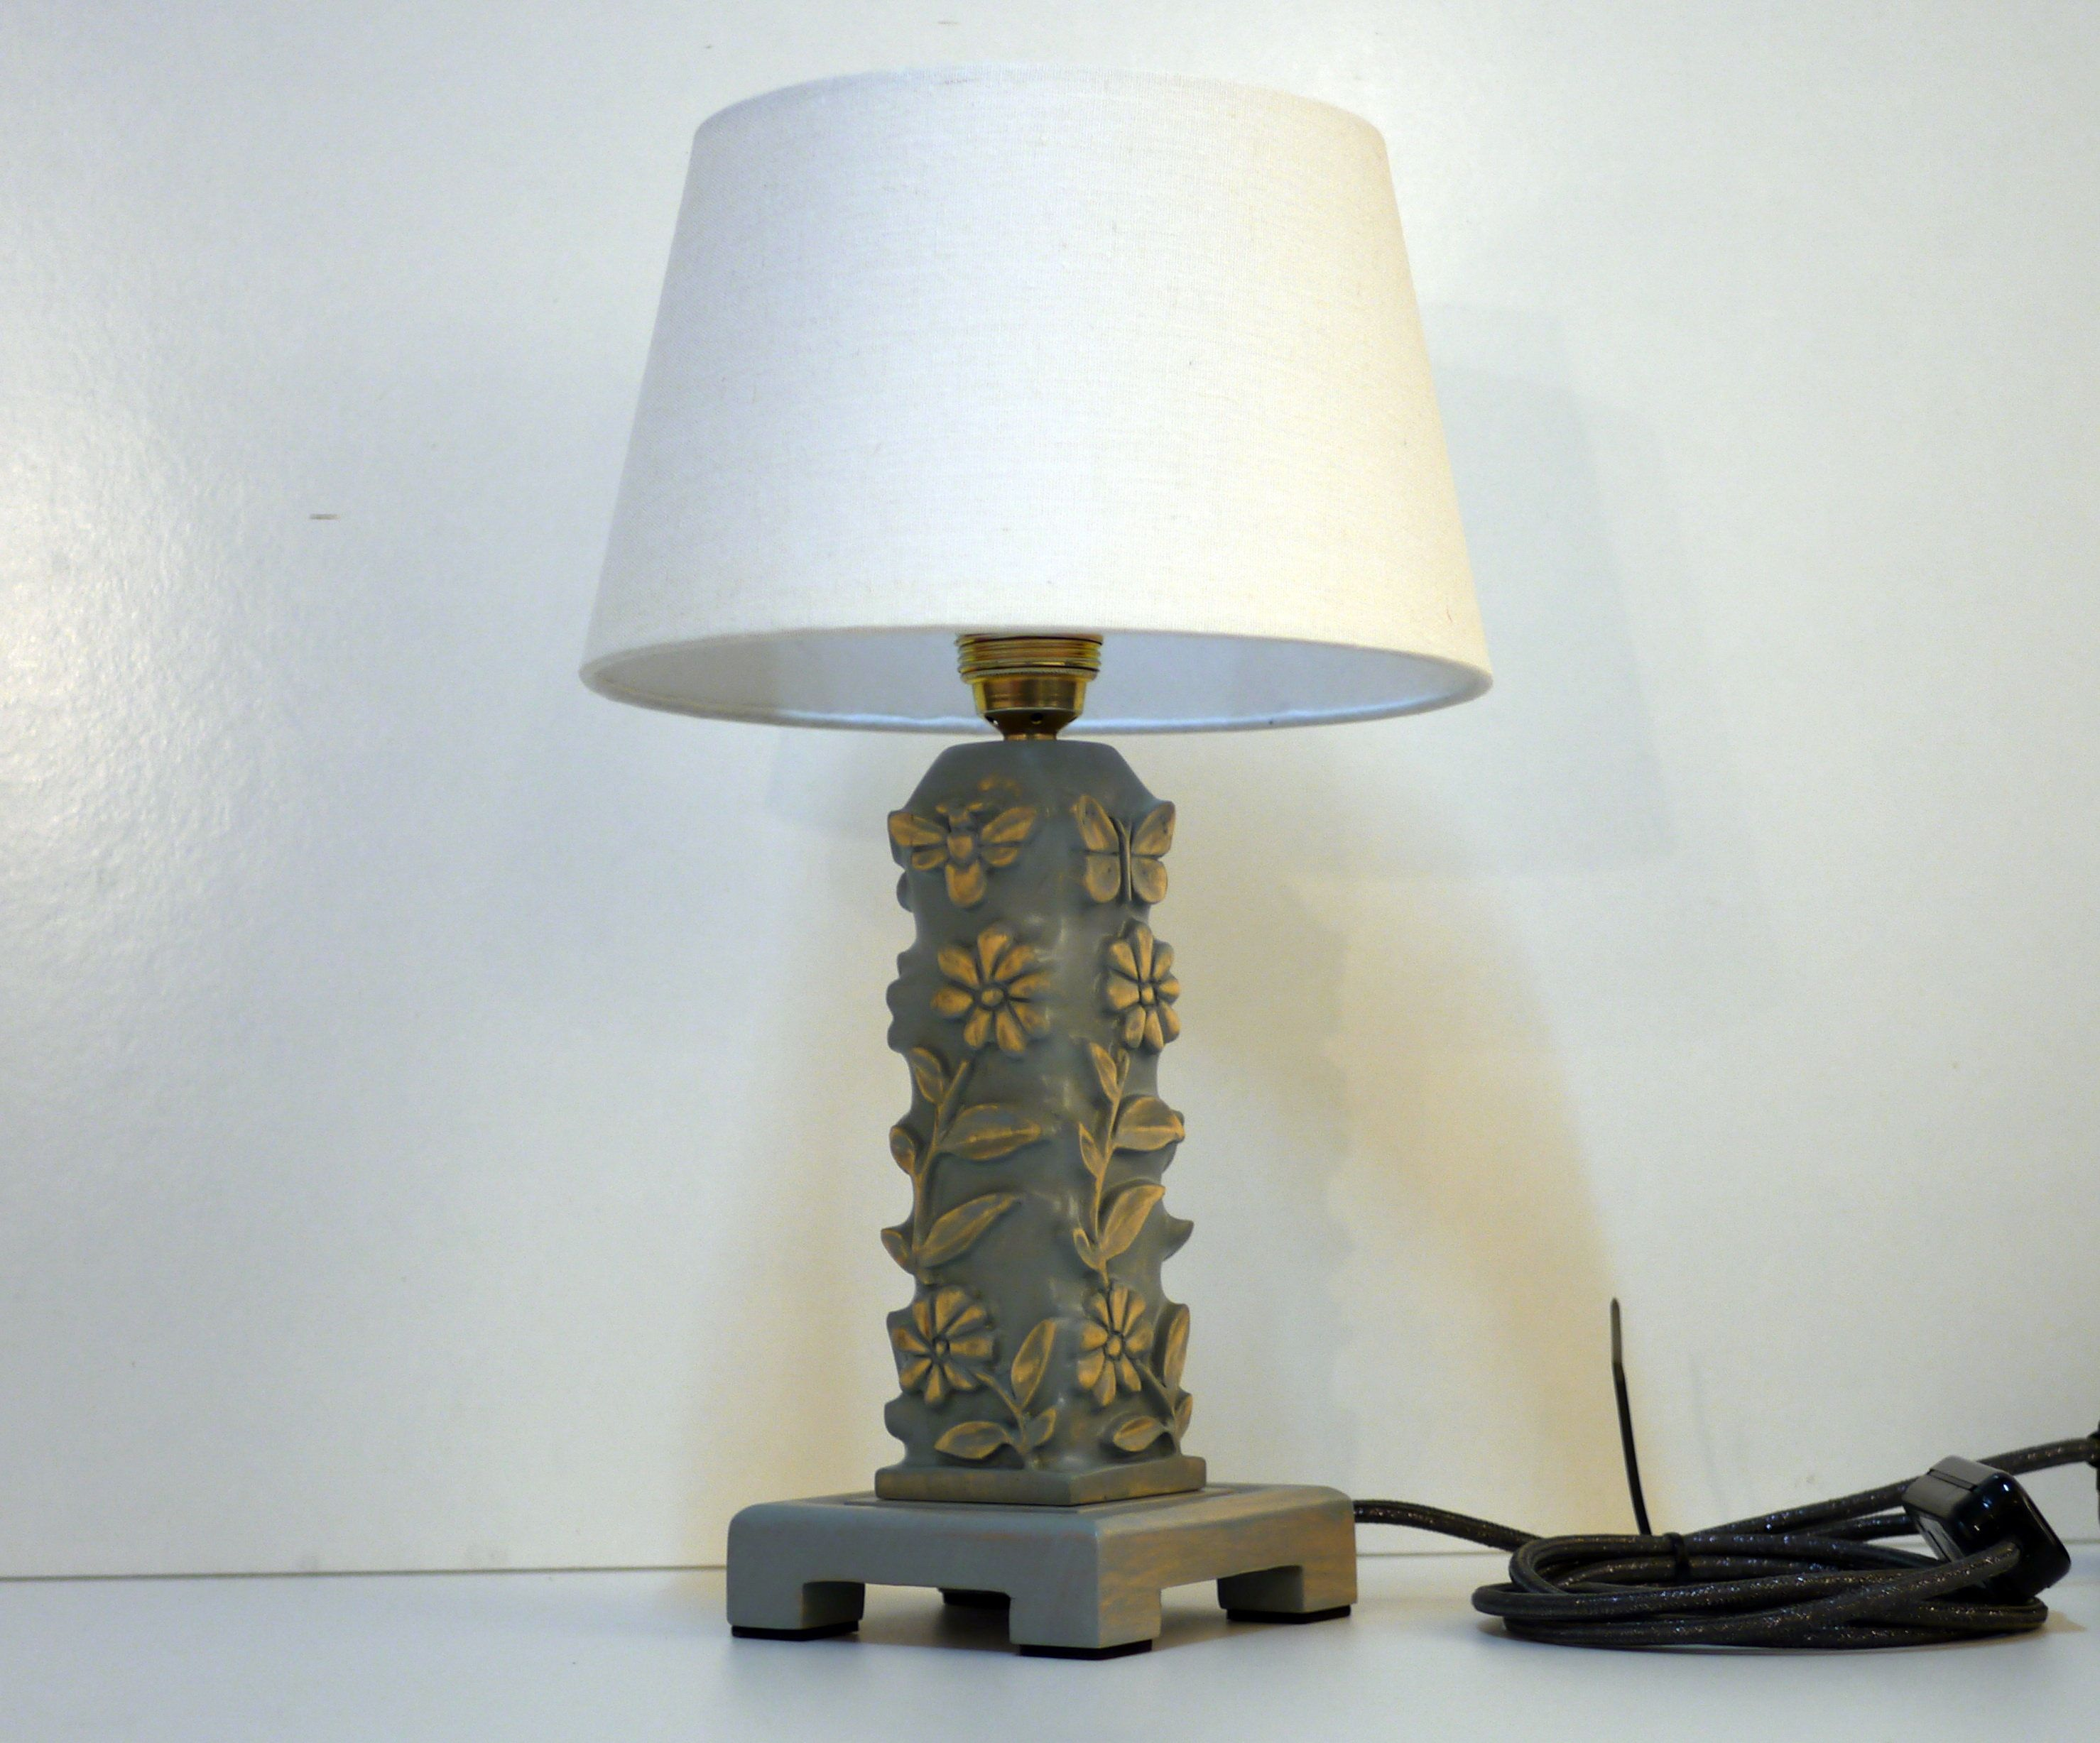 Tischlampe Holz geschnitzt taubenblau (With images) Lamp